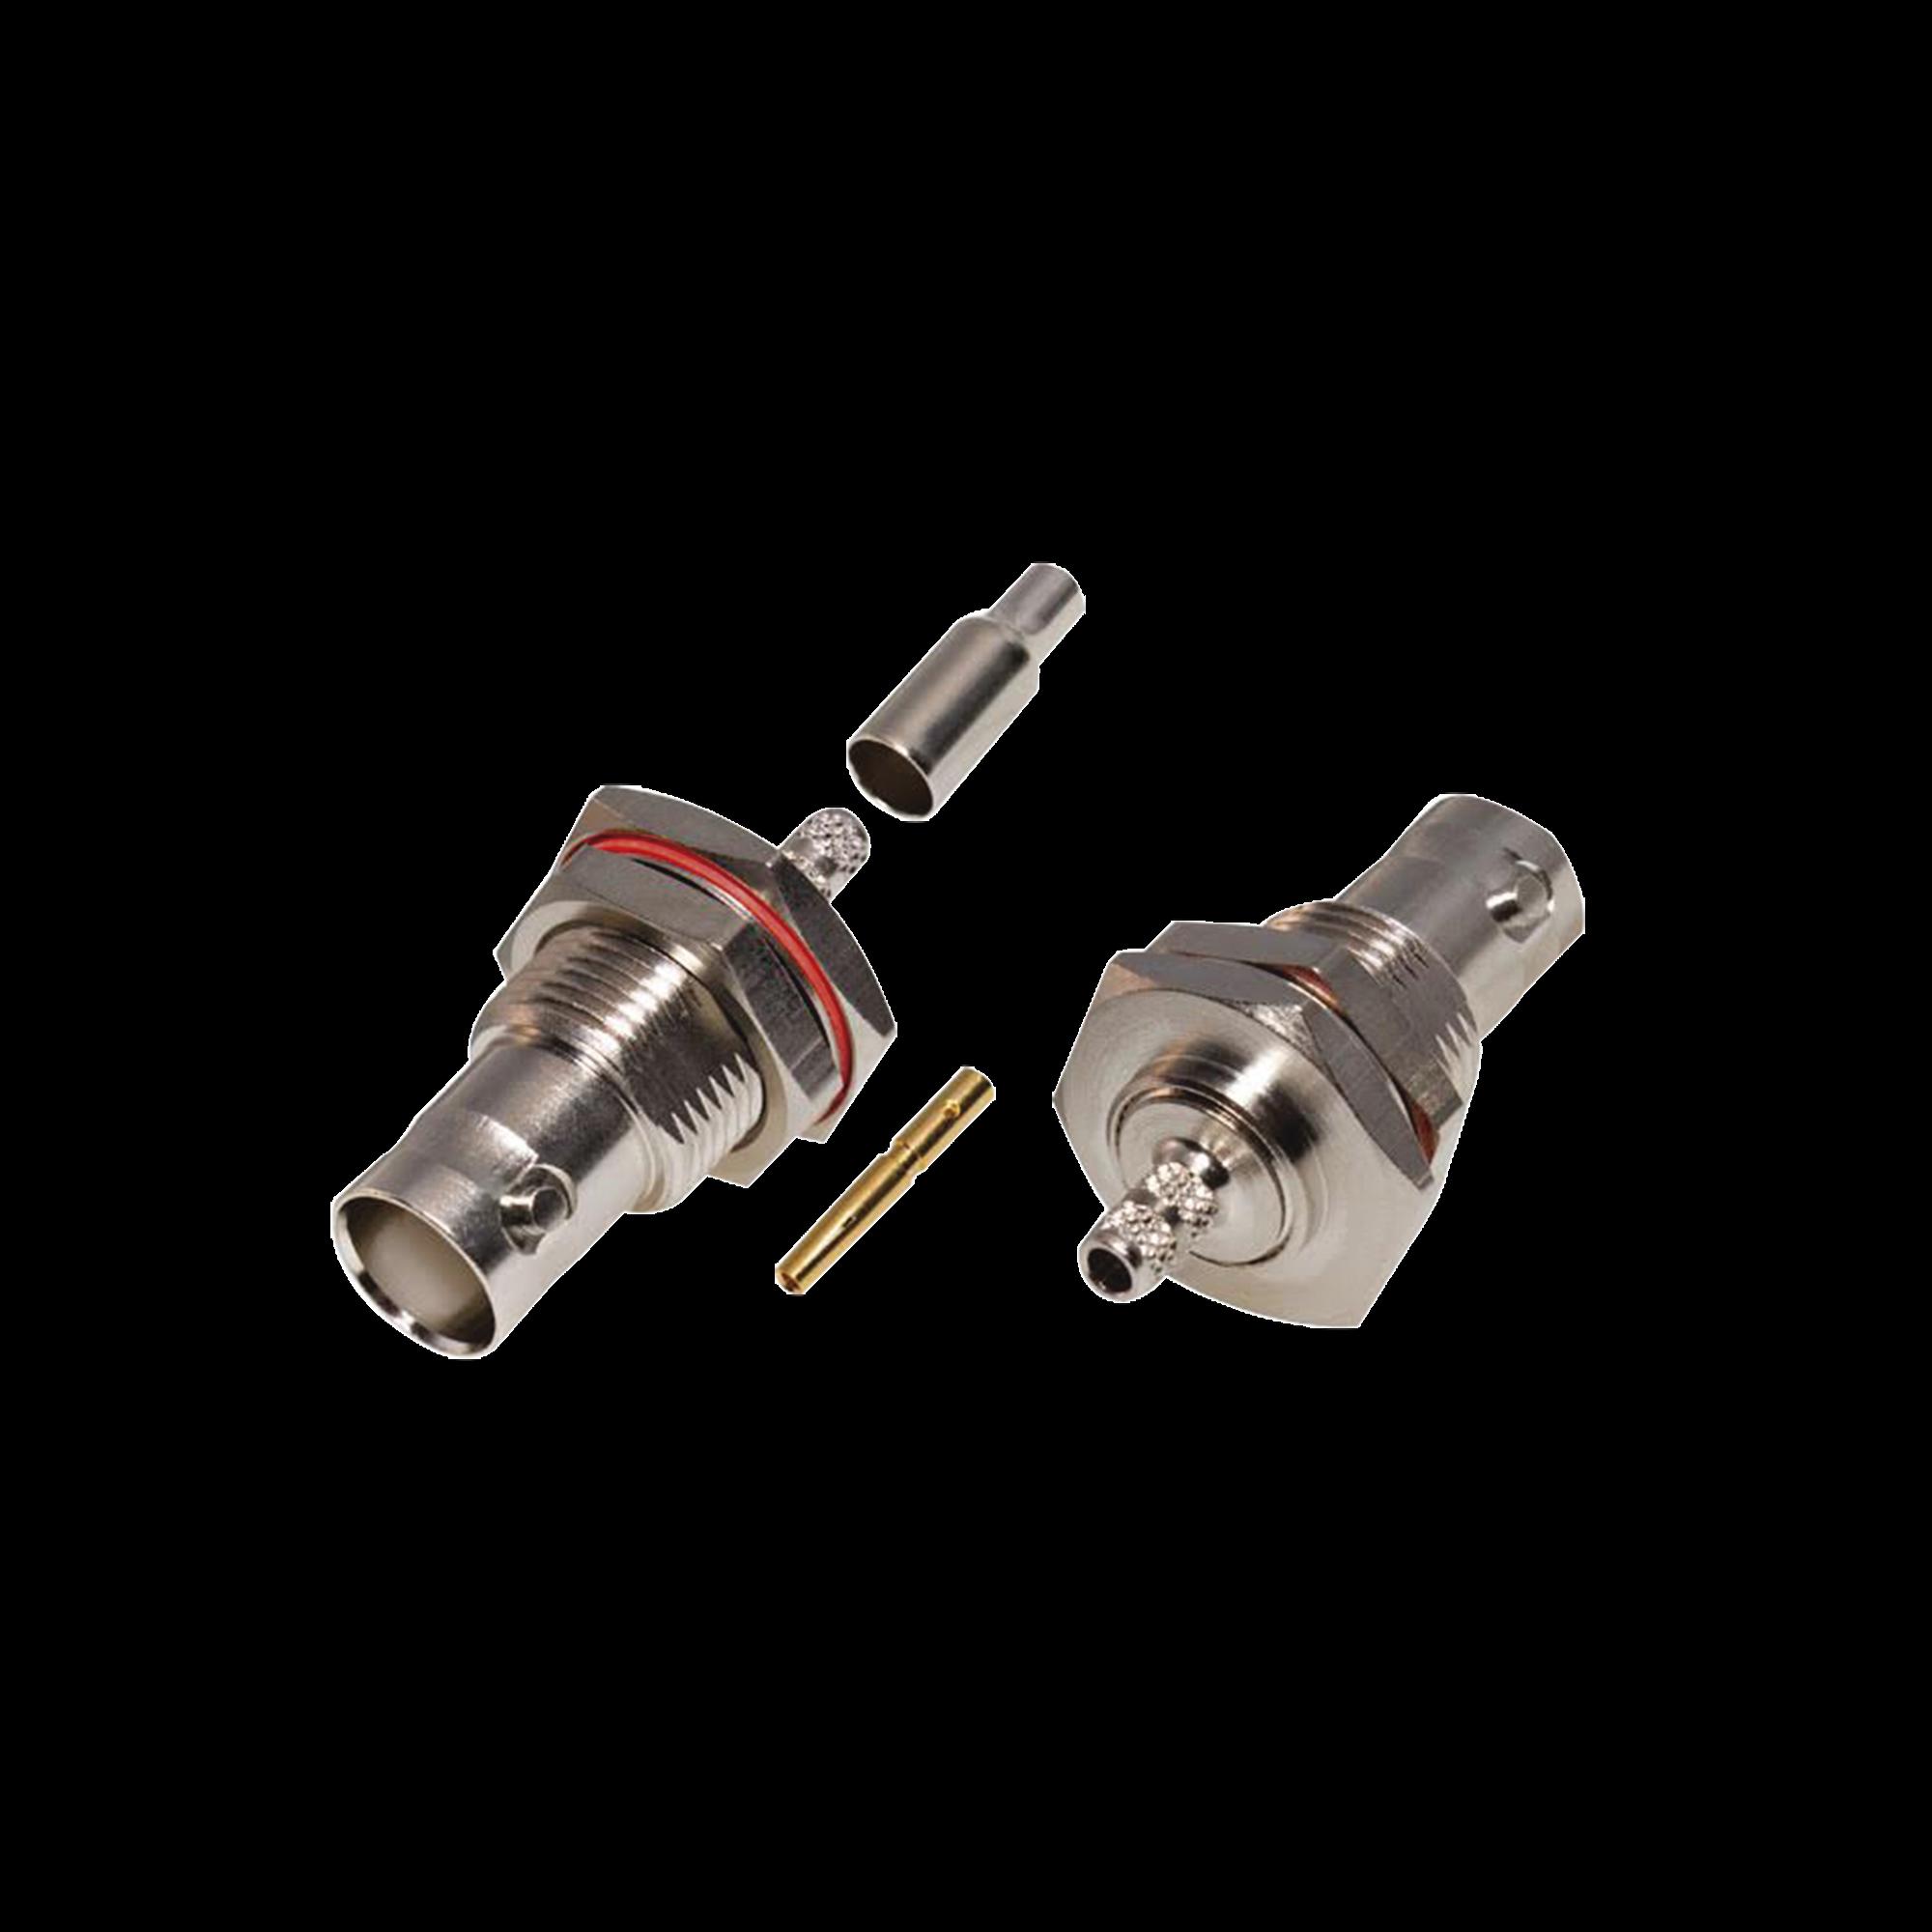 Conector BNC Hembra /Chasis en D-Plano, Anillo Plegable/ RG-316/U, Niquel/Oro/Teflón.